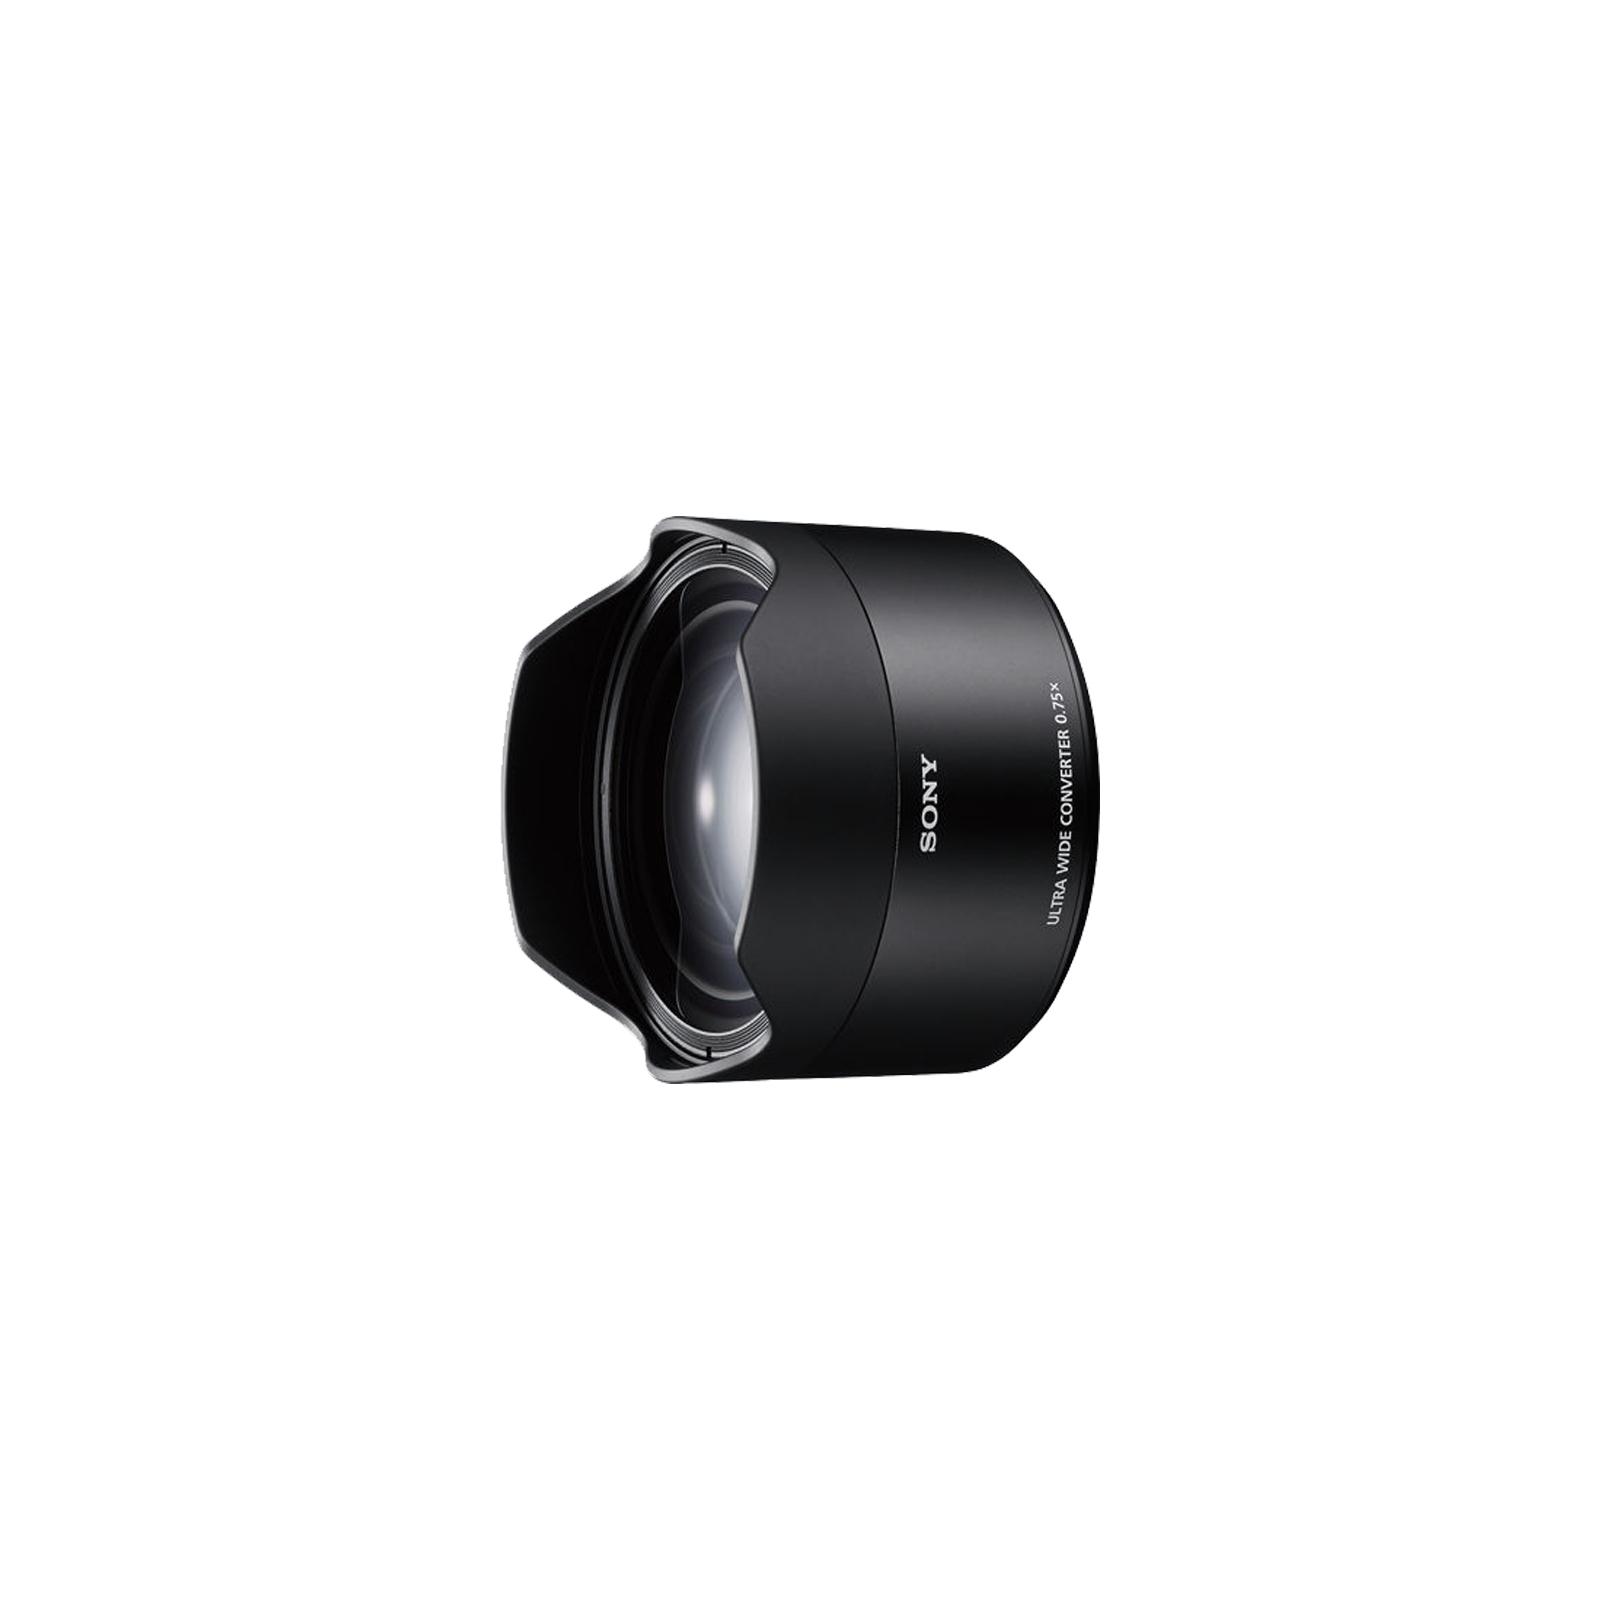 Фото-адаптер SONY широкоугольная для SEL 28mm f2.0 FE (SEL075UWC.SYX)